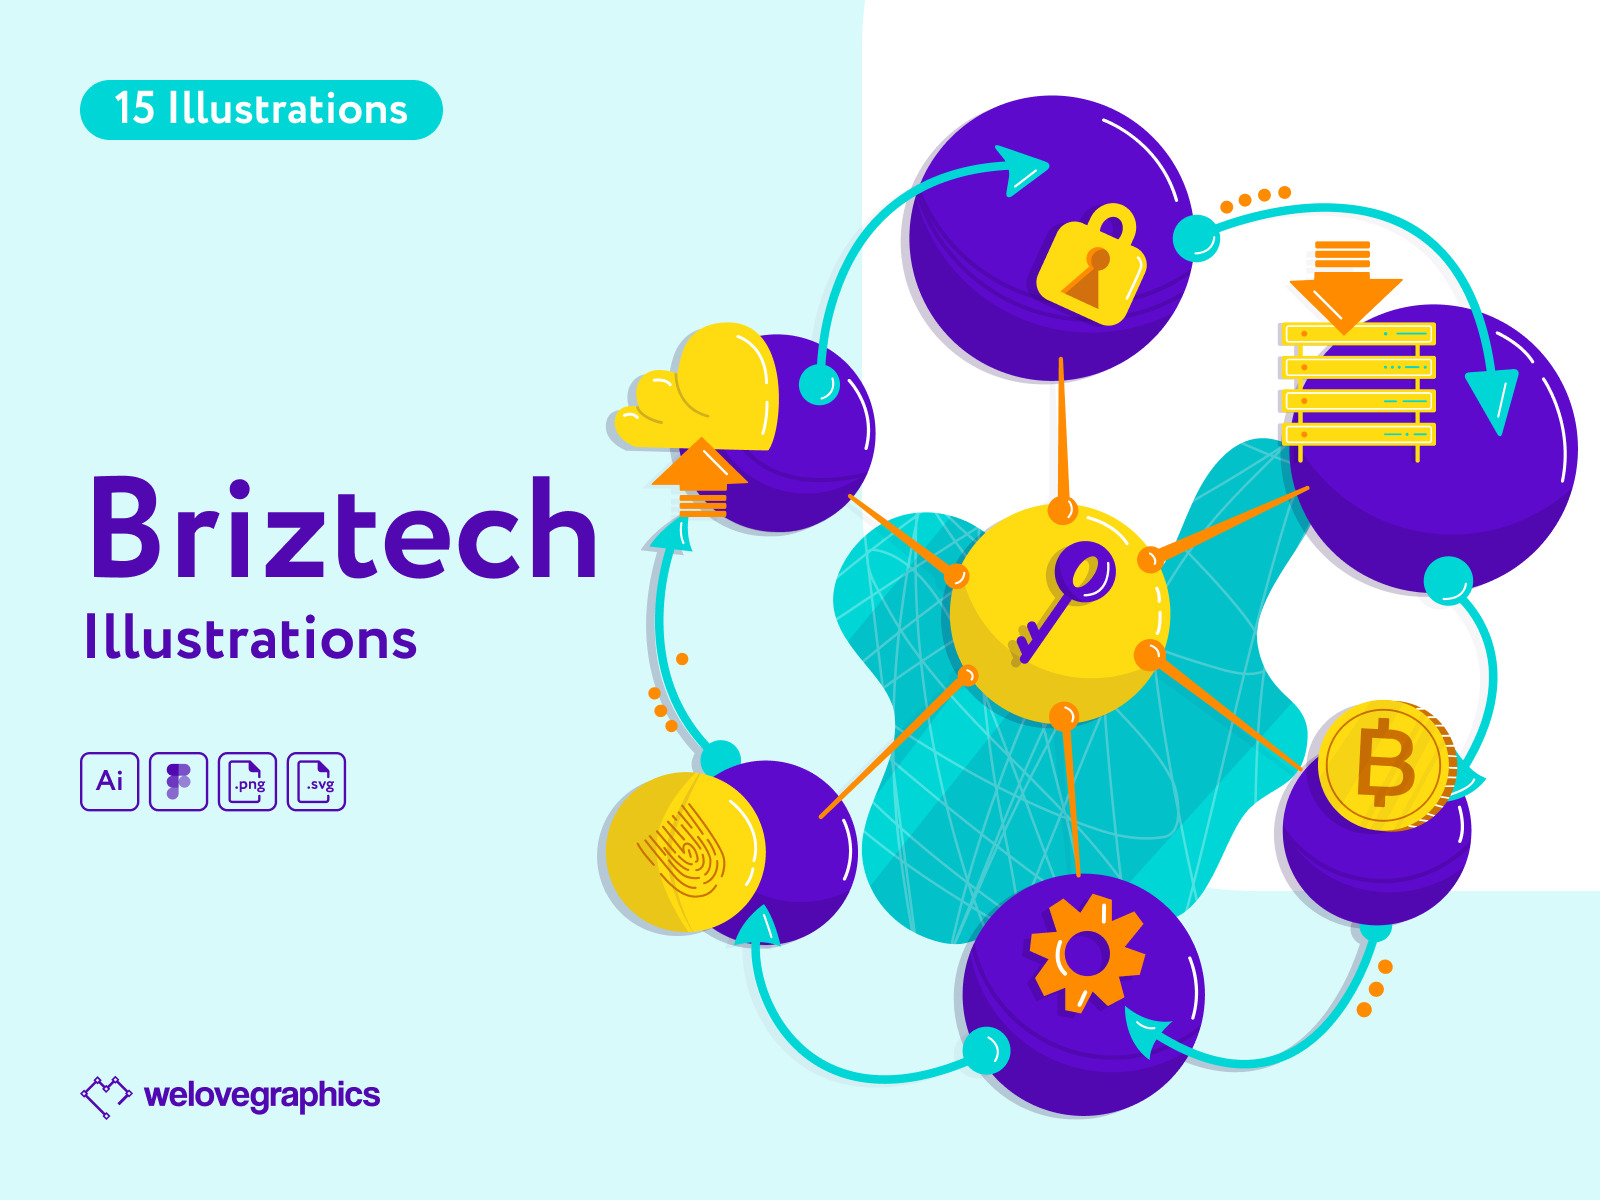 Briztech Illustrations